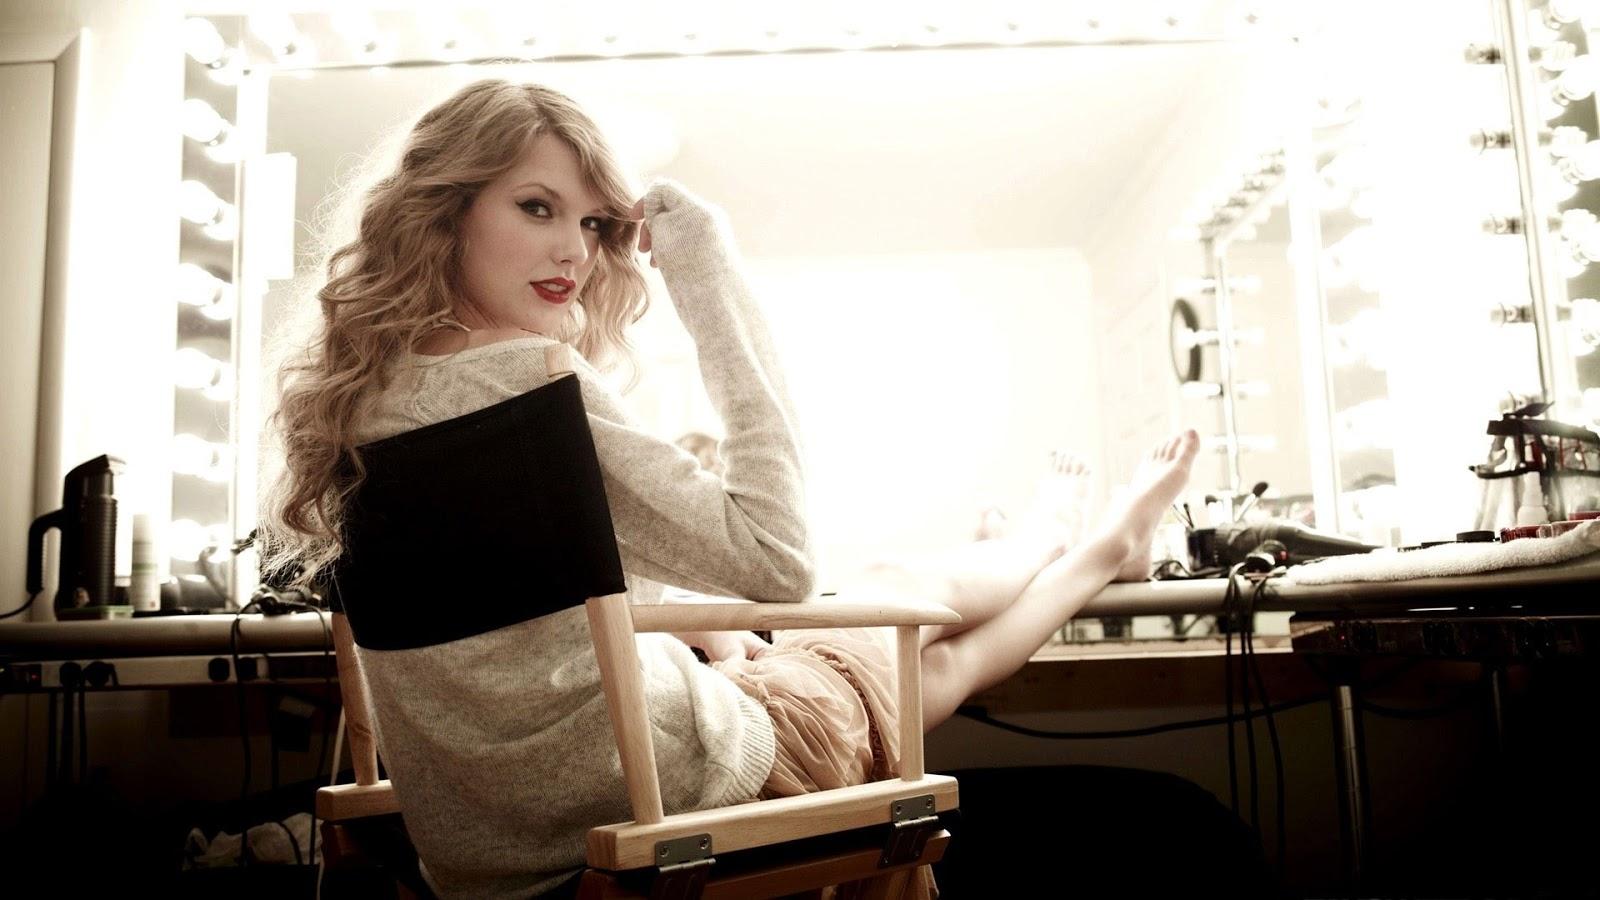 Singer Taylor Swift Wallpaper